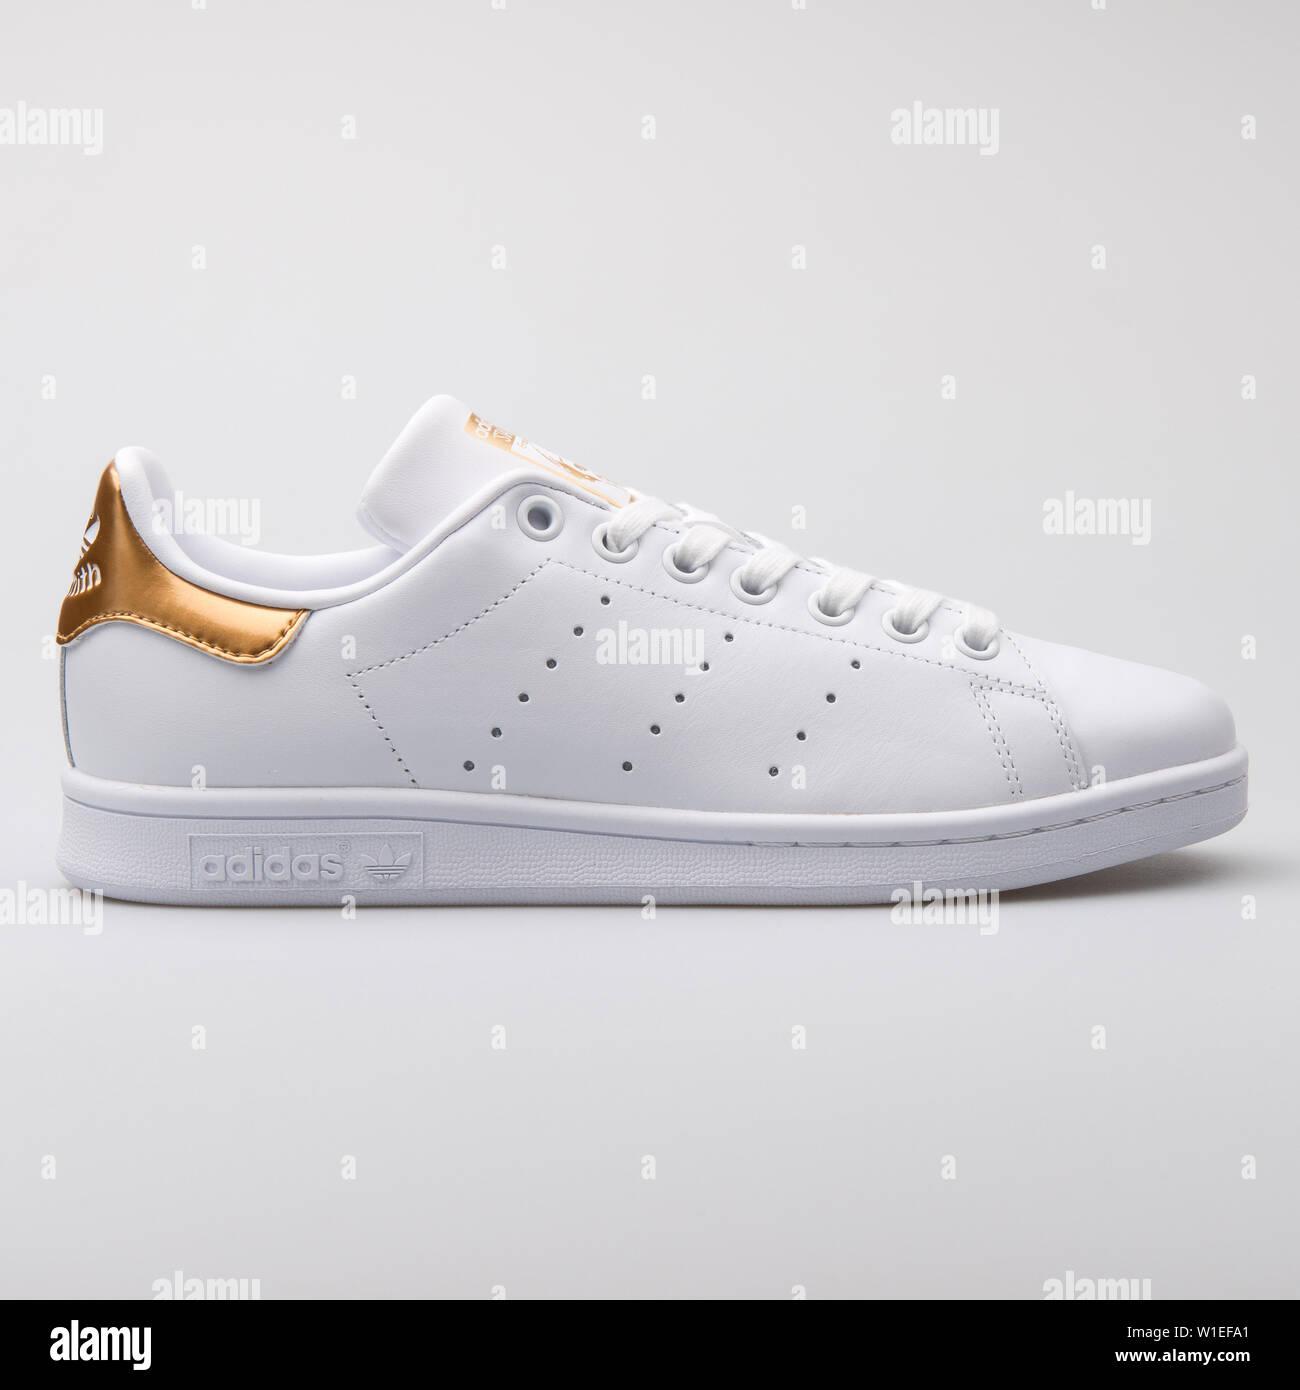 new concept b8f82 85c92 VIENNA, AUSTRIA - AUGUST 7, 2017: Adidas Stan Smith white ...